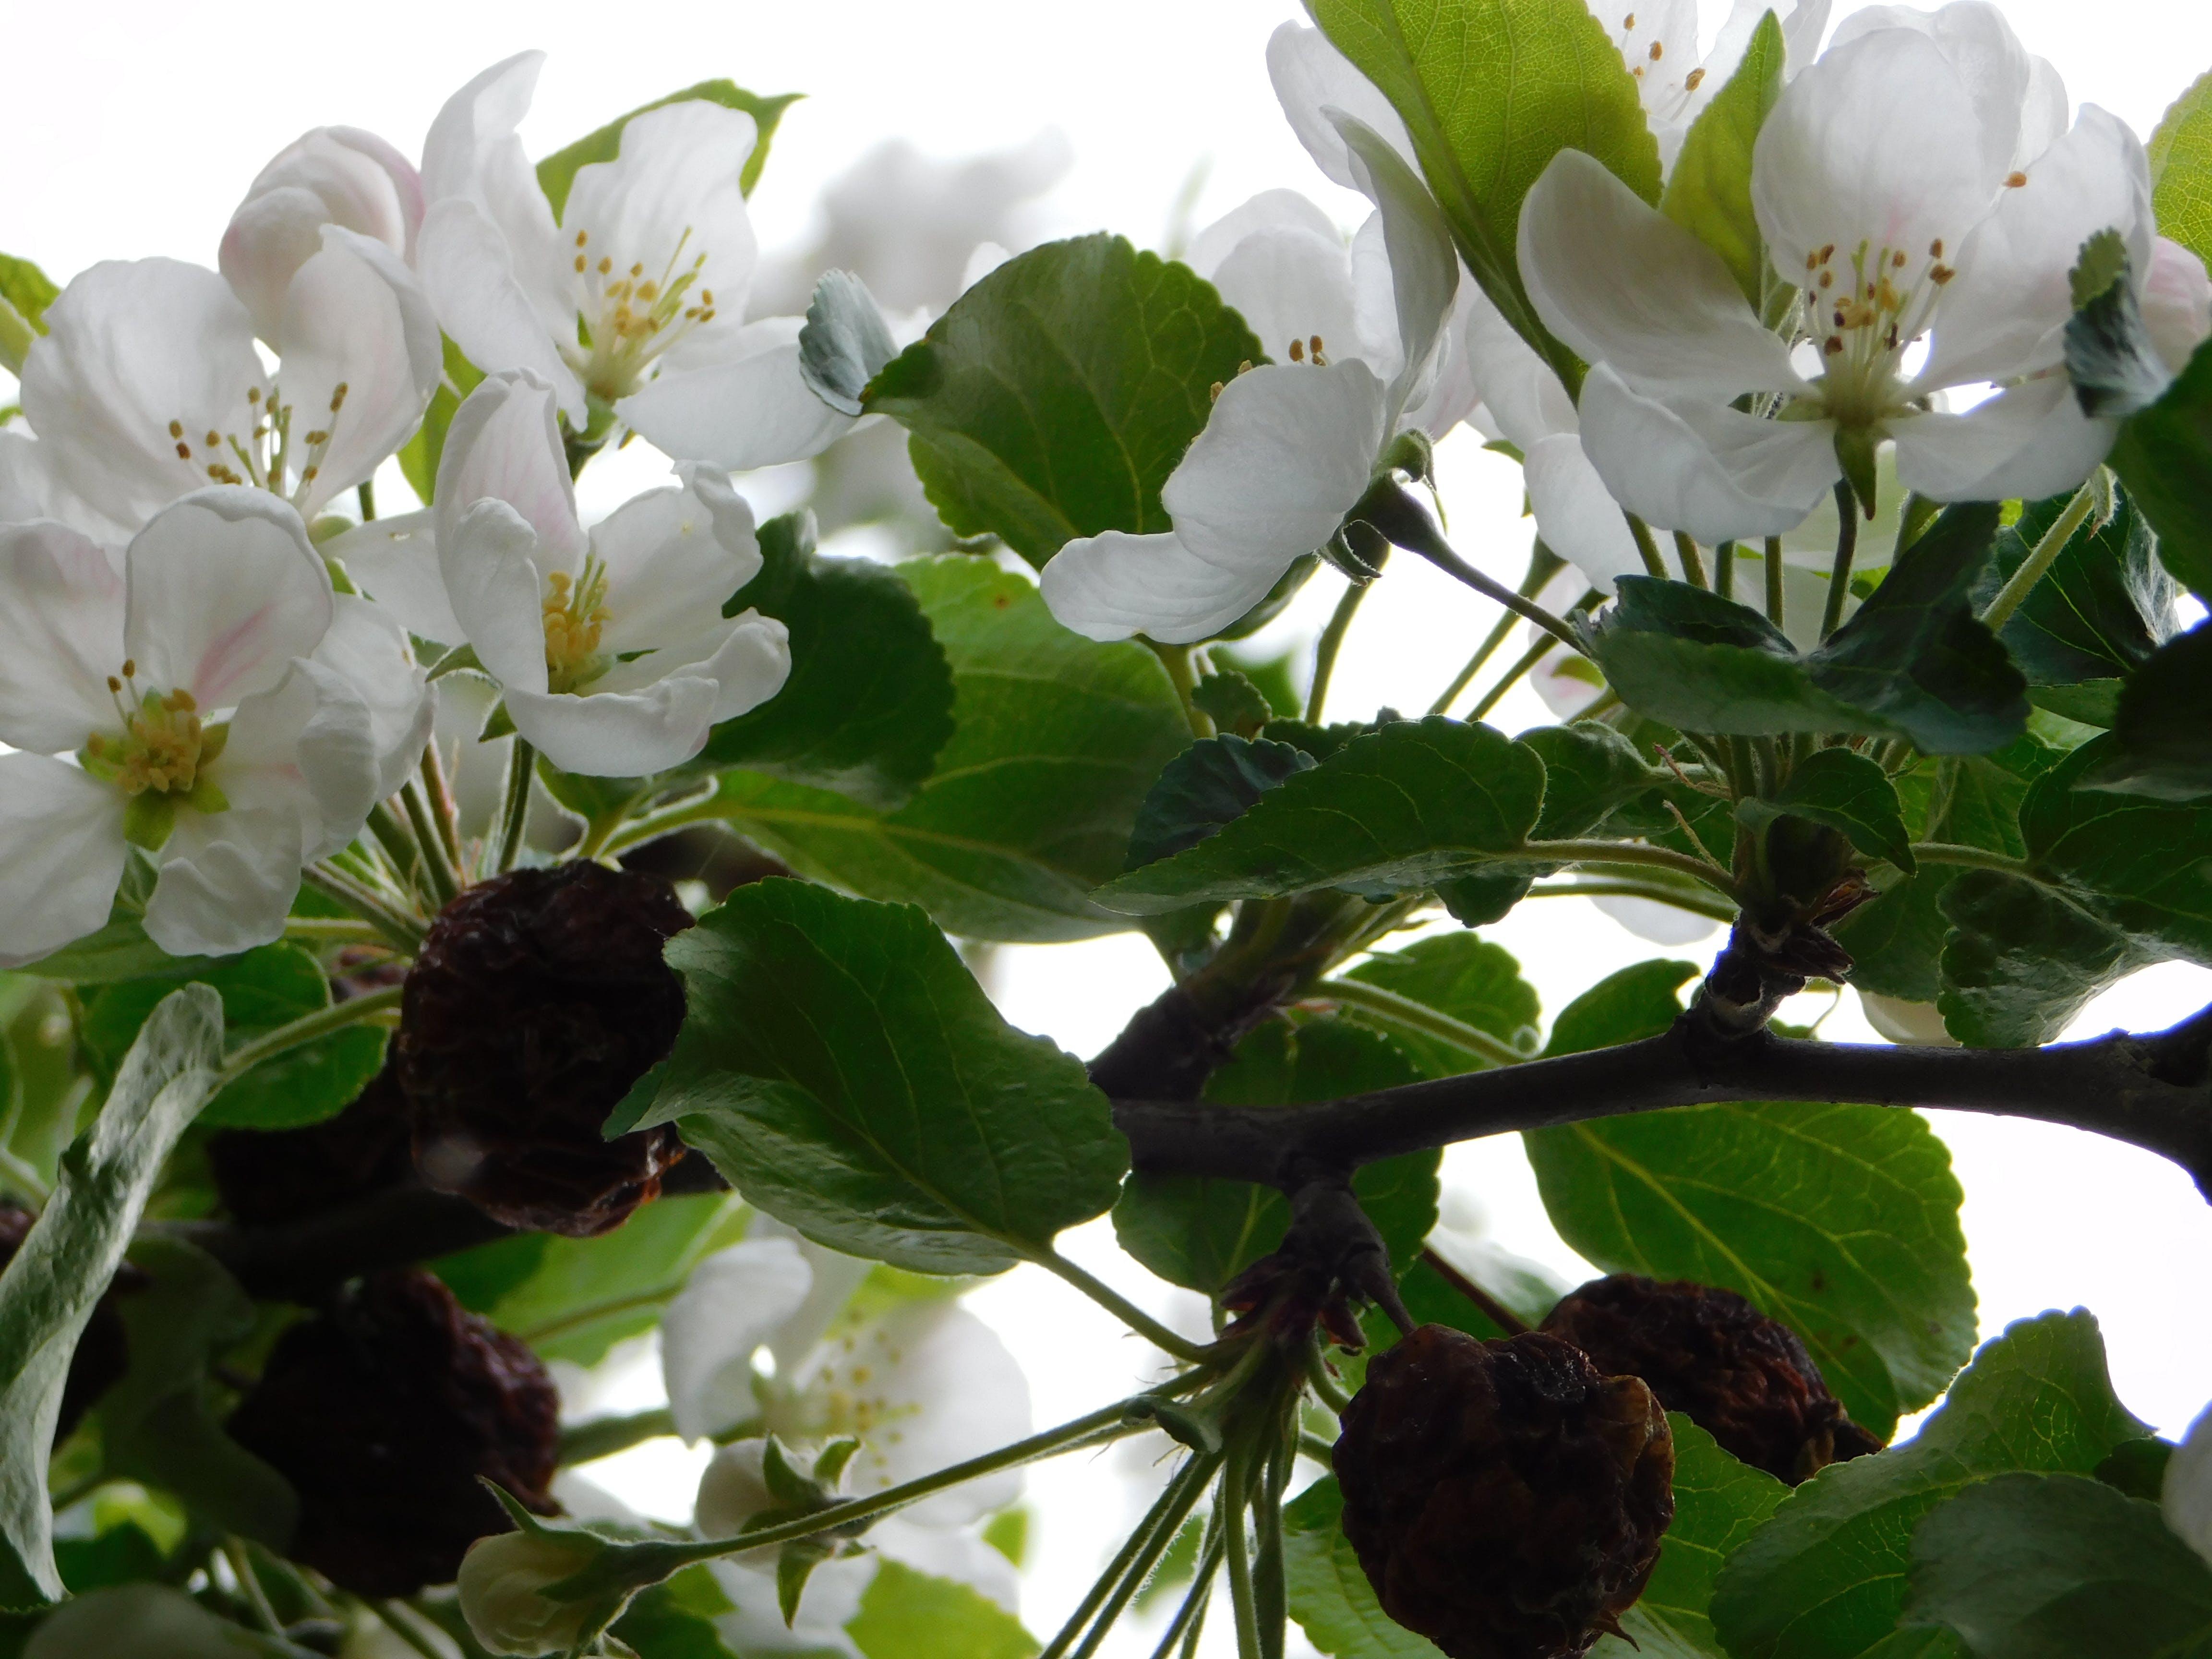 Foto stok gratis bunga-bunga indah